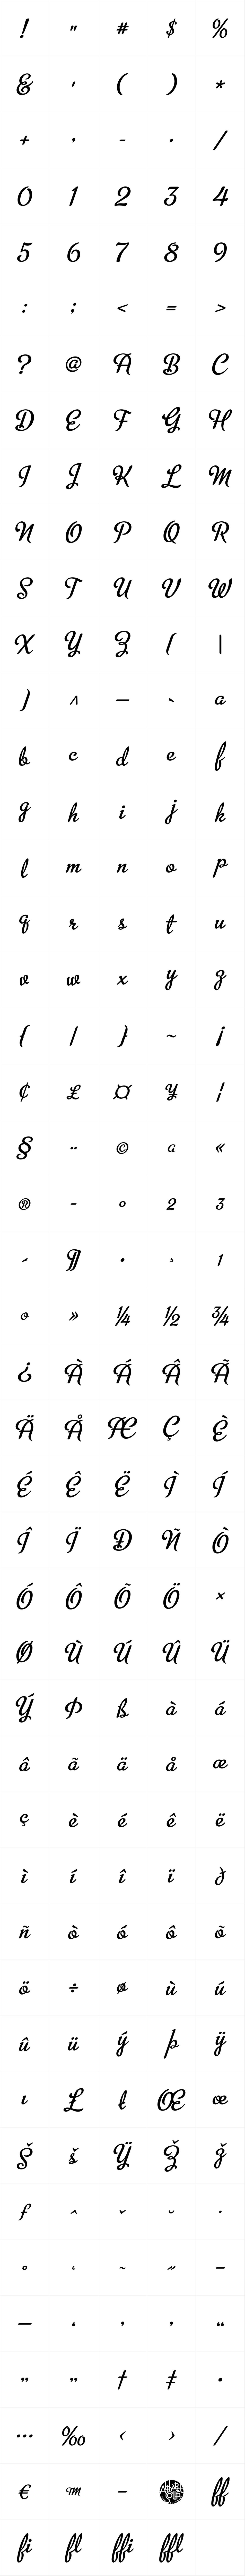 Metroscript